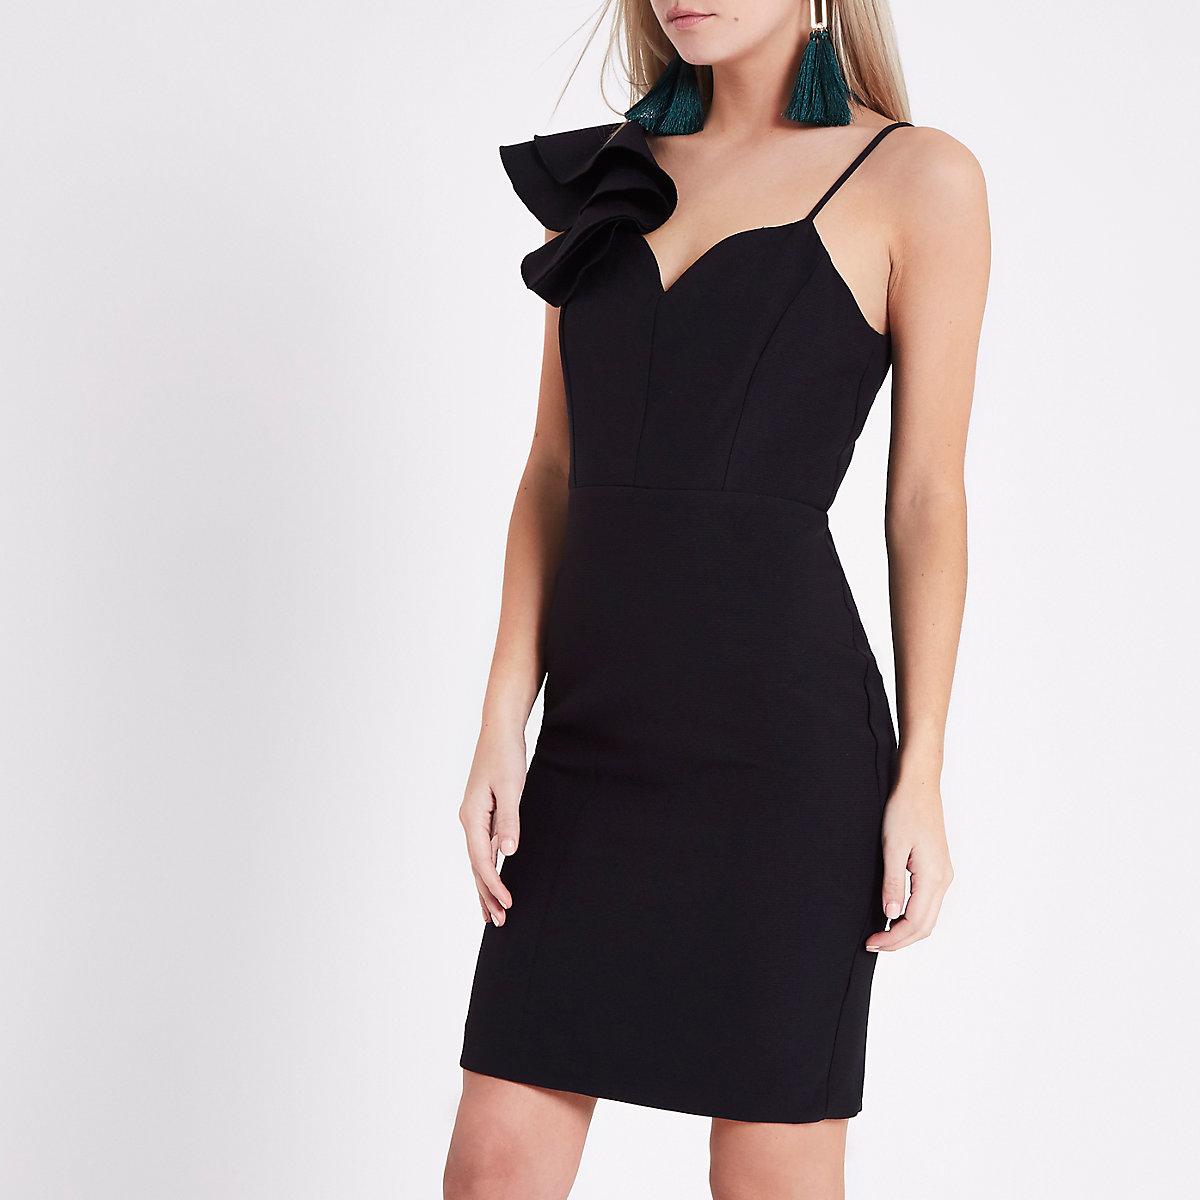 Petite black one shoulder bodycon dress